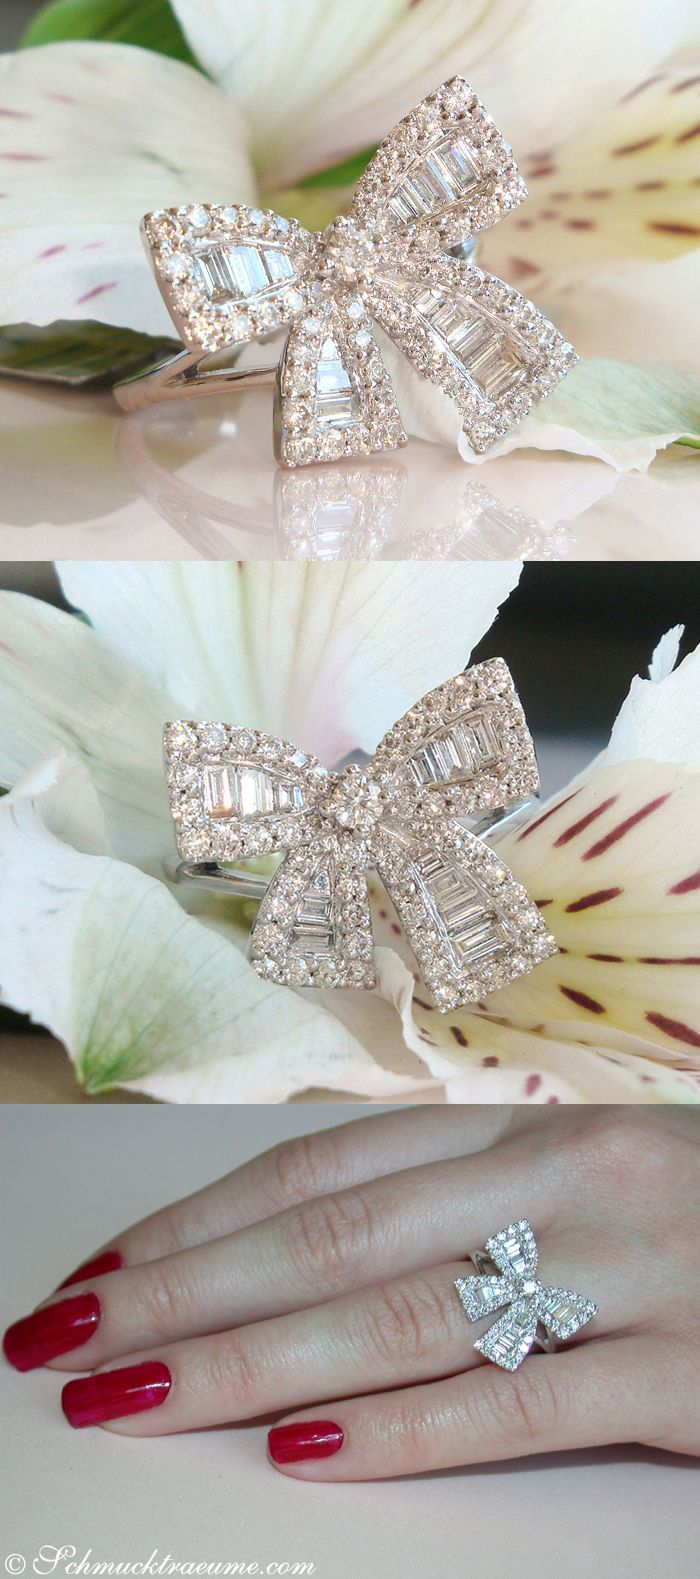 Idée et inspiration Bague Diamant :   Image   Description   Cute Diamond Bow Ring, 1,11 cts. H-SI1/2, WG18K – Find out: schmucktraeume.com – Like: www.facebook.com/… – Contact: info@schmucktraeu…